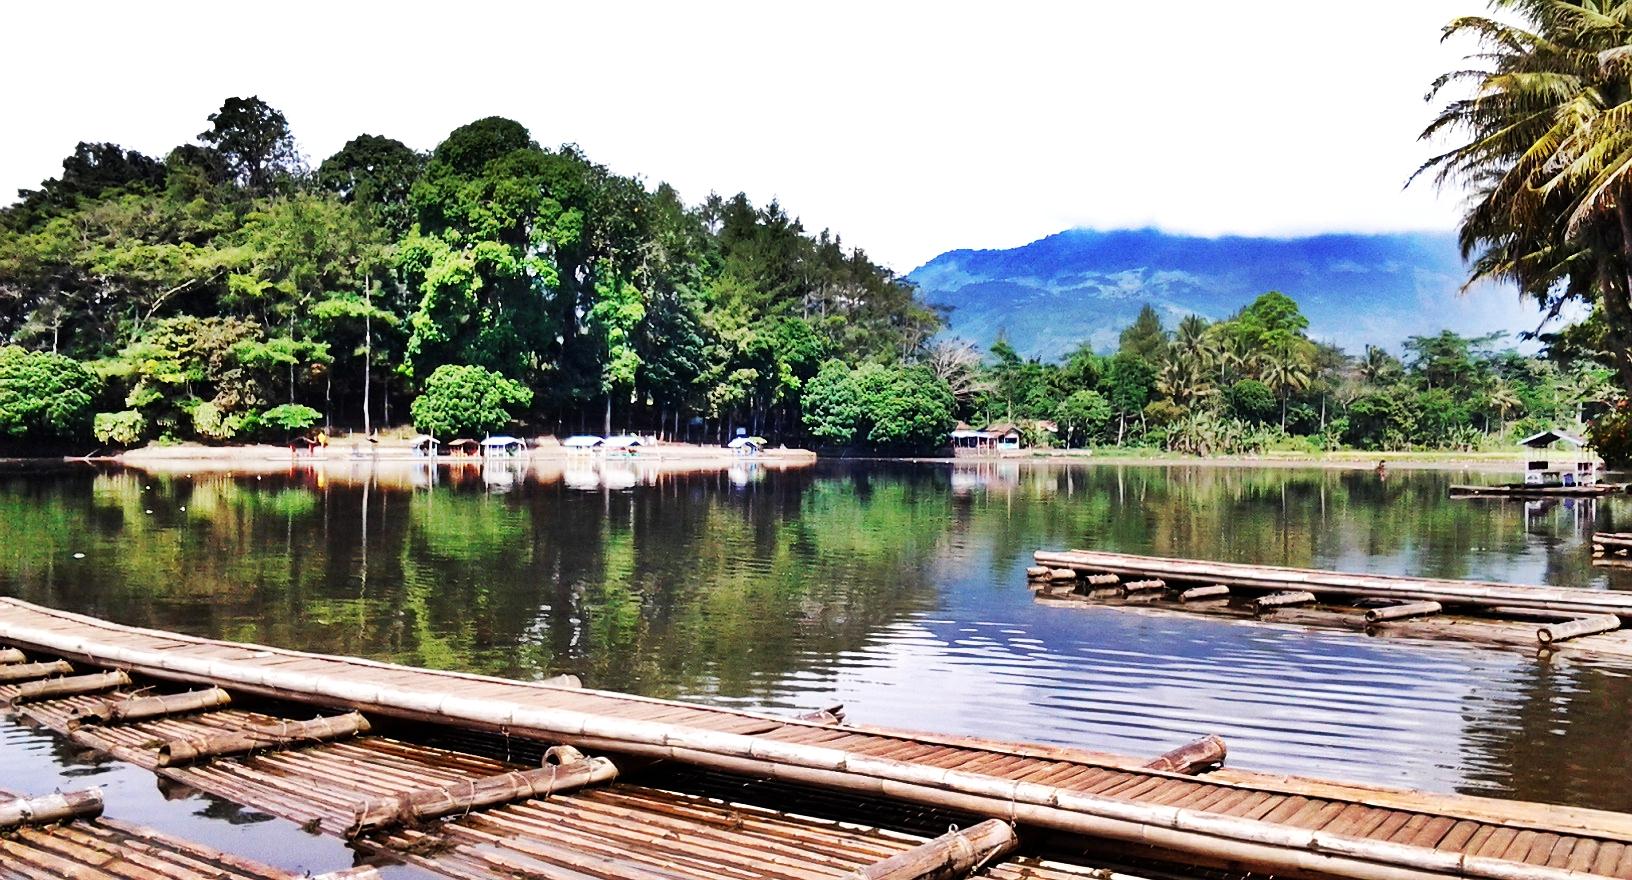 tempat wisata di garut jawa barat rh csyuniar blogspot com